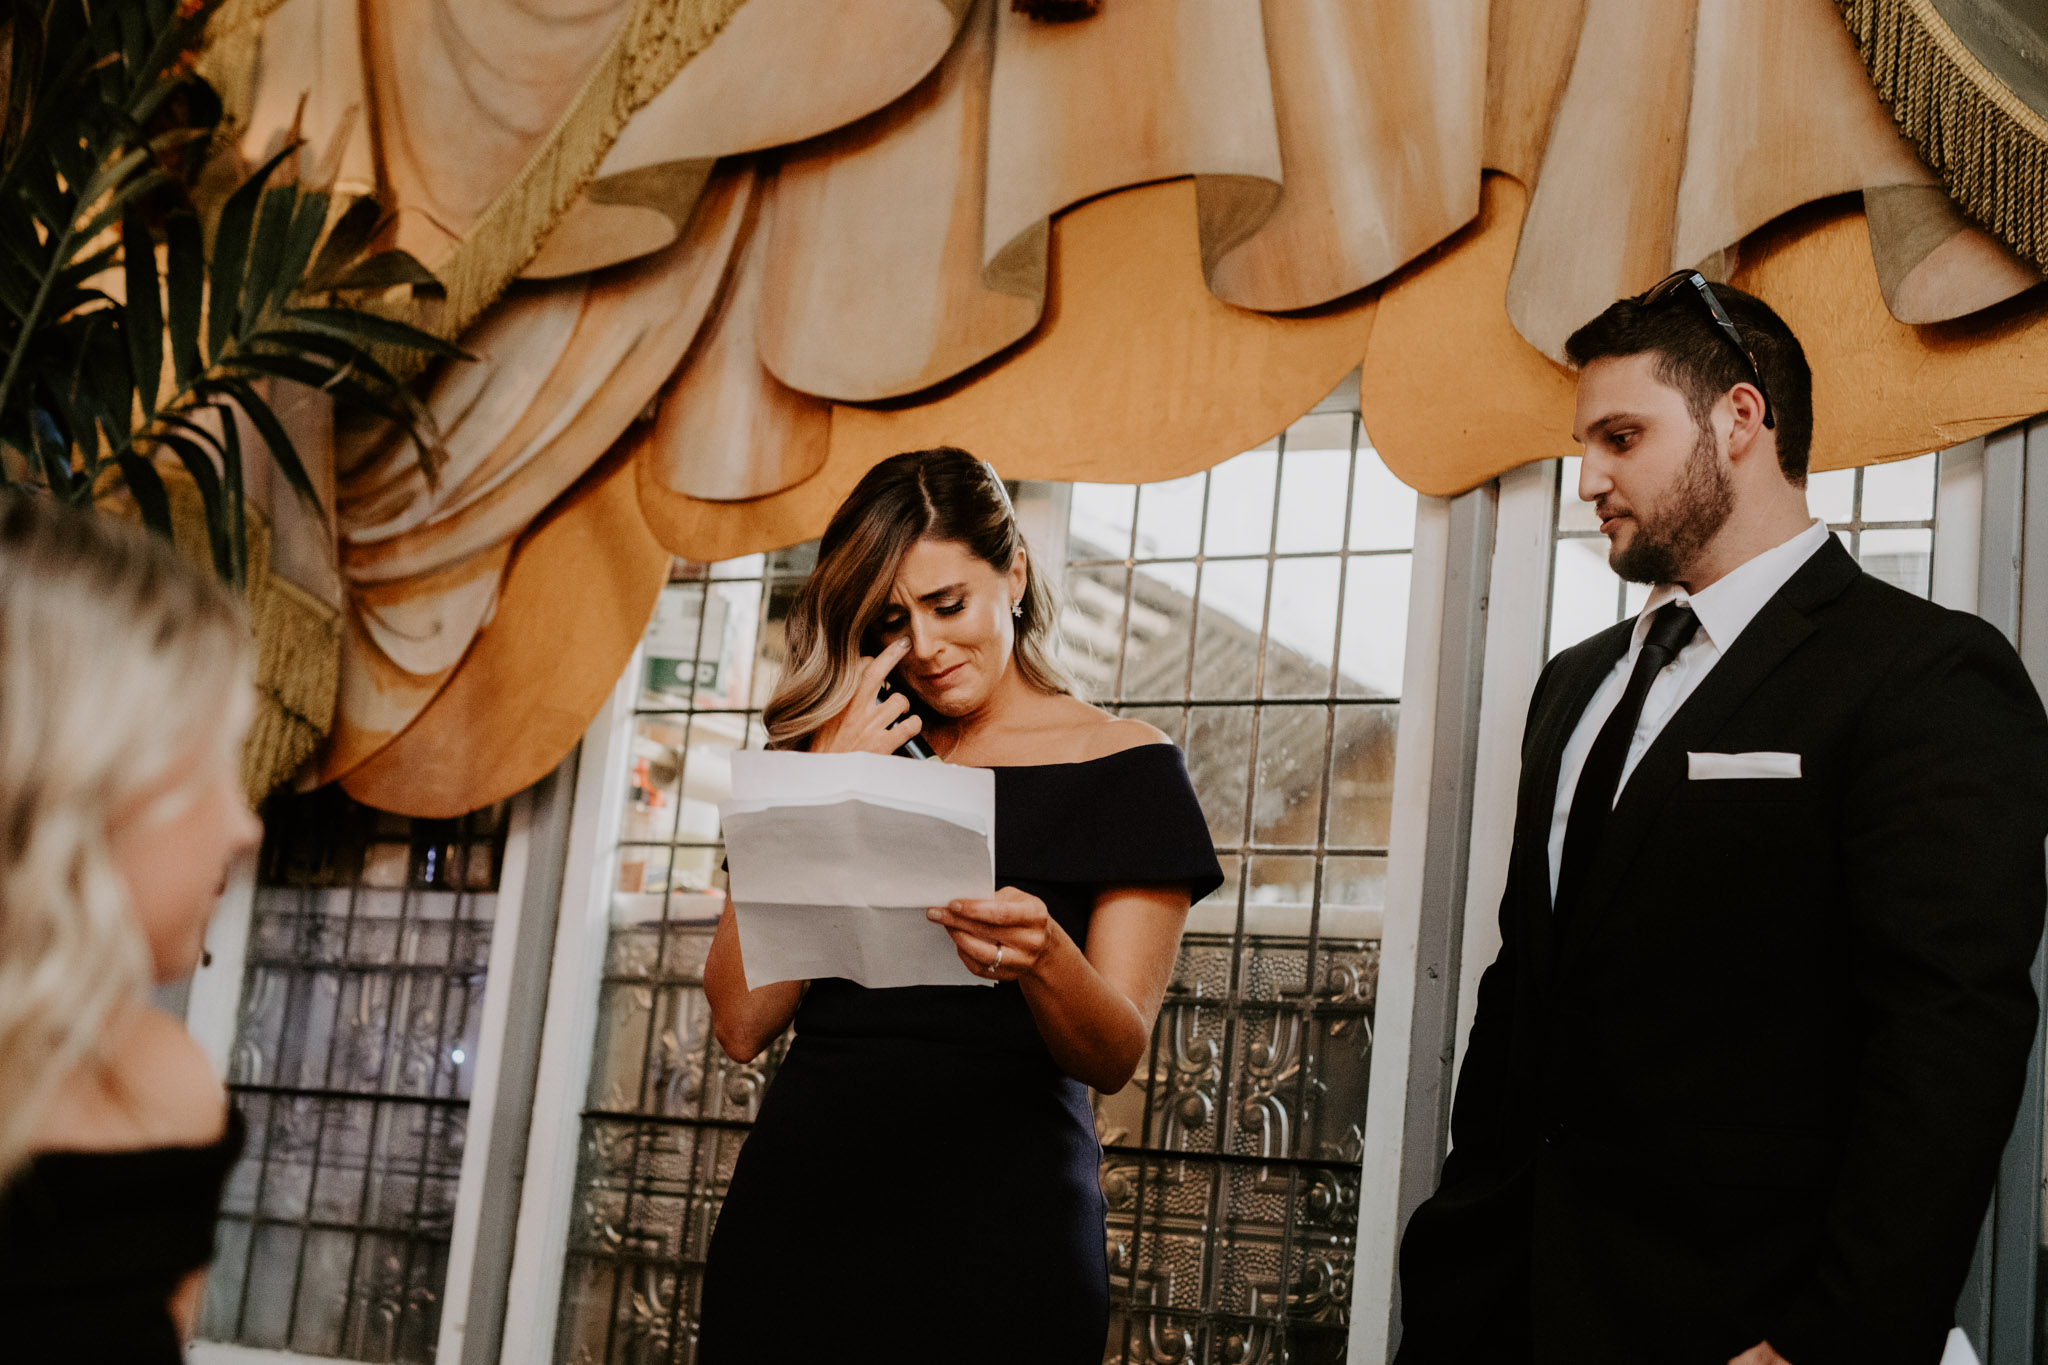 Liberty Village Wedding - emotional speeches